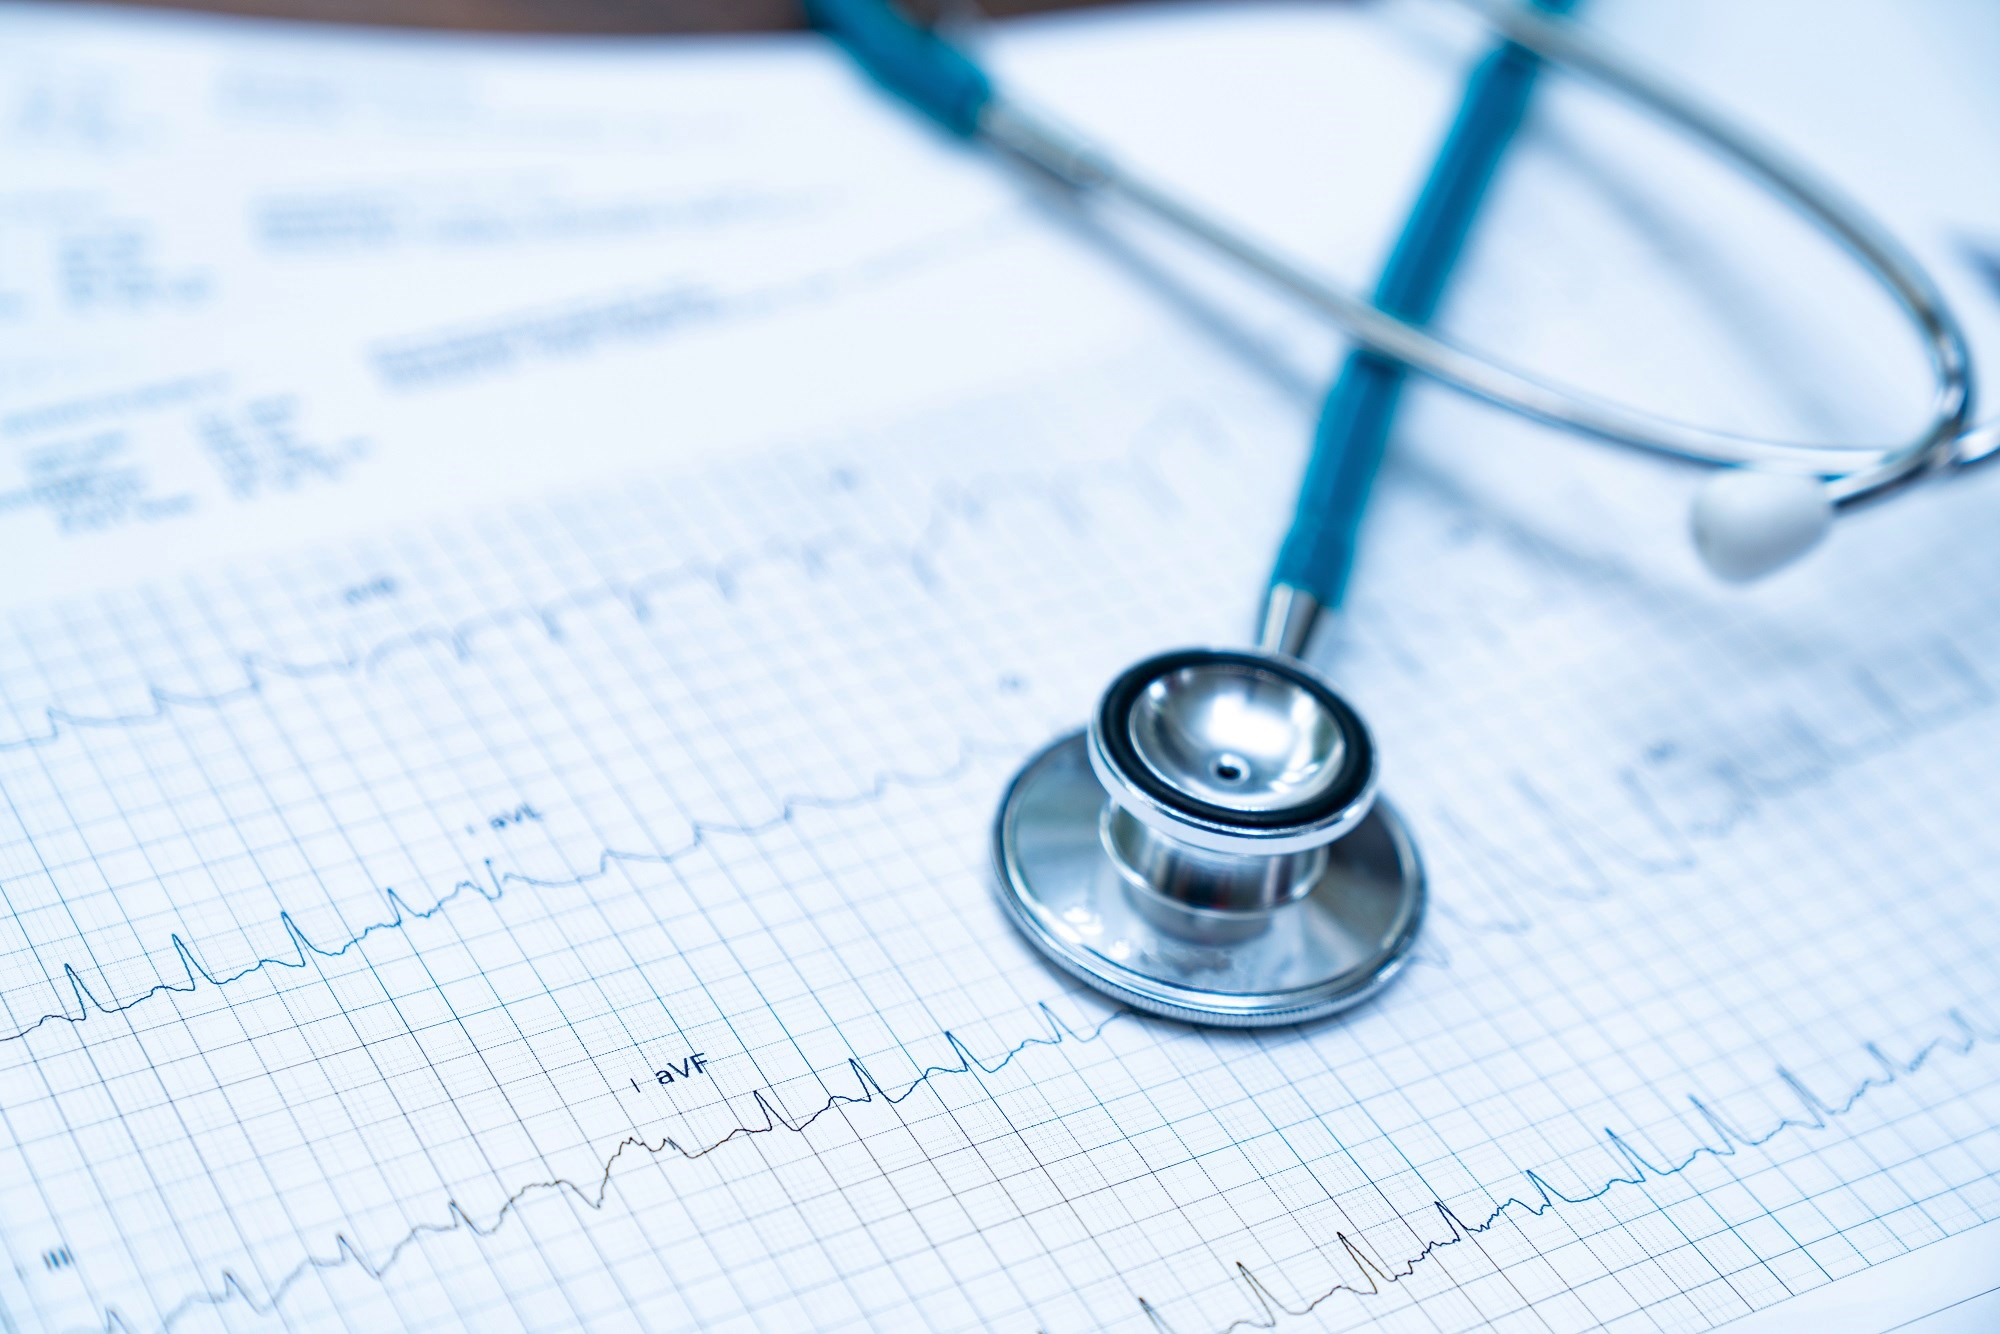 Wearable Cardioverter-Defibrillator May Not Decrease Risk for Post-MI Arrhythmic Death